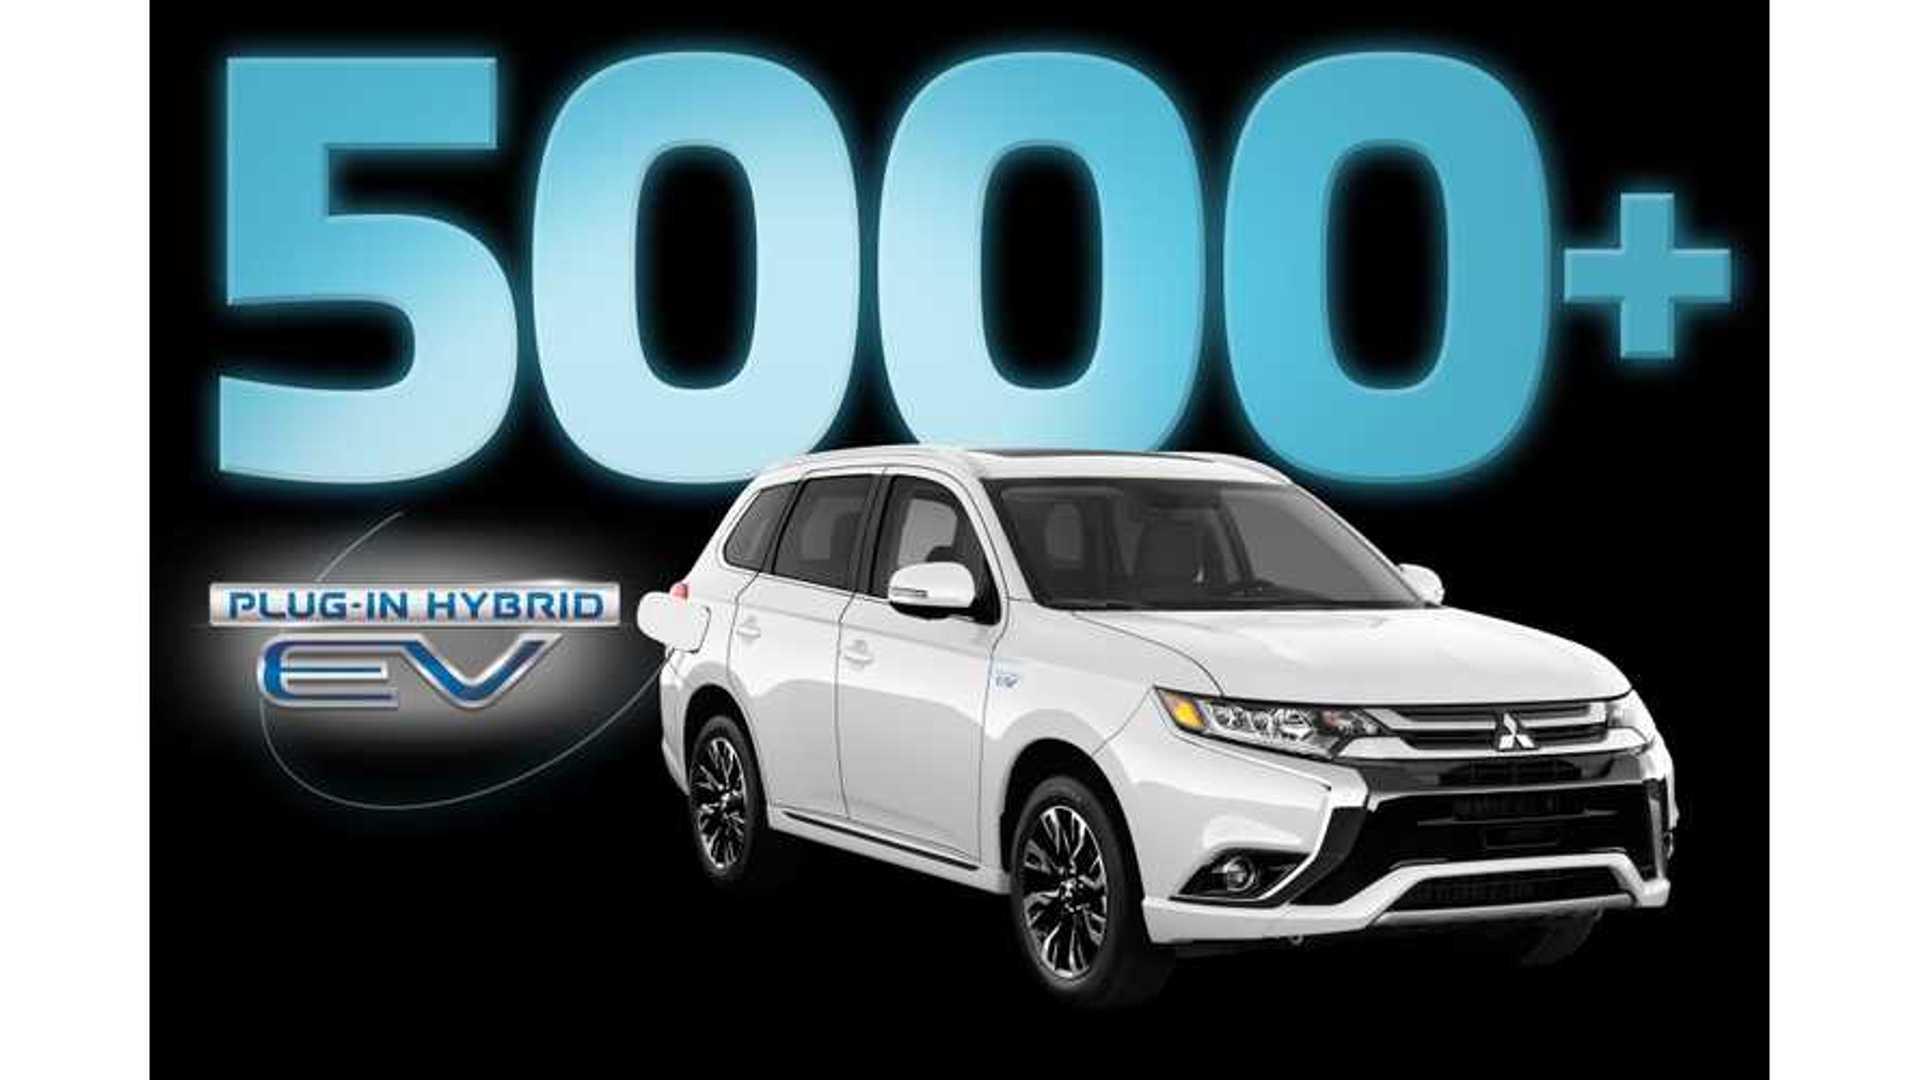 Mitsubishi St Hyacinthe >> Mitsubishi Outlander Phev Sales Booming In Canada